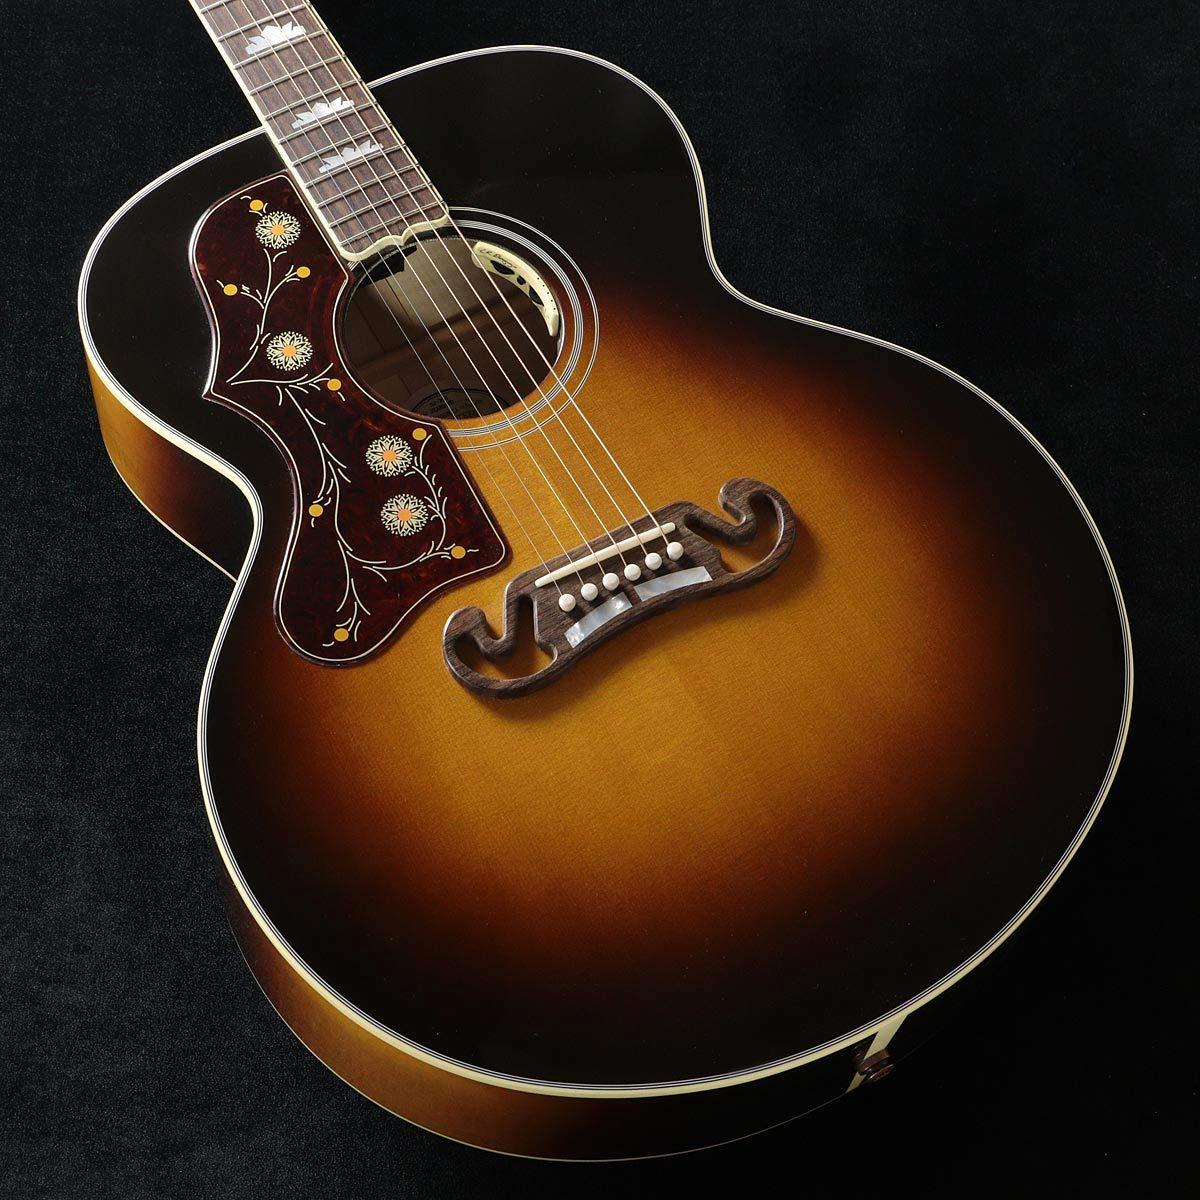 Gibson/SJ-200 Standard LH Vintage Sunburst B07QVCXB4D